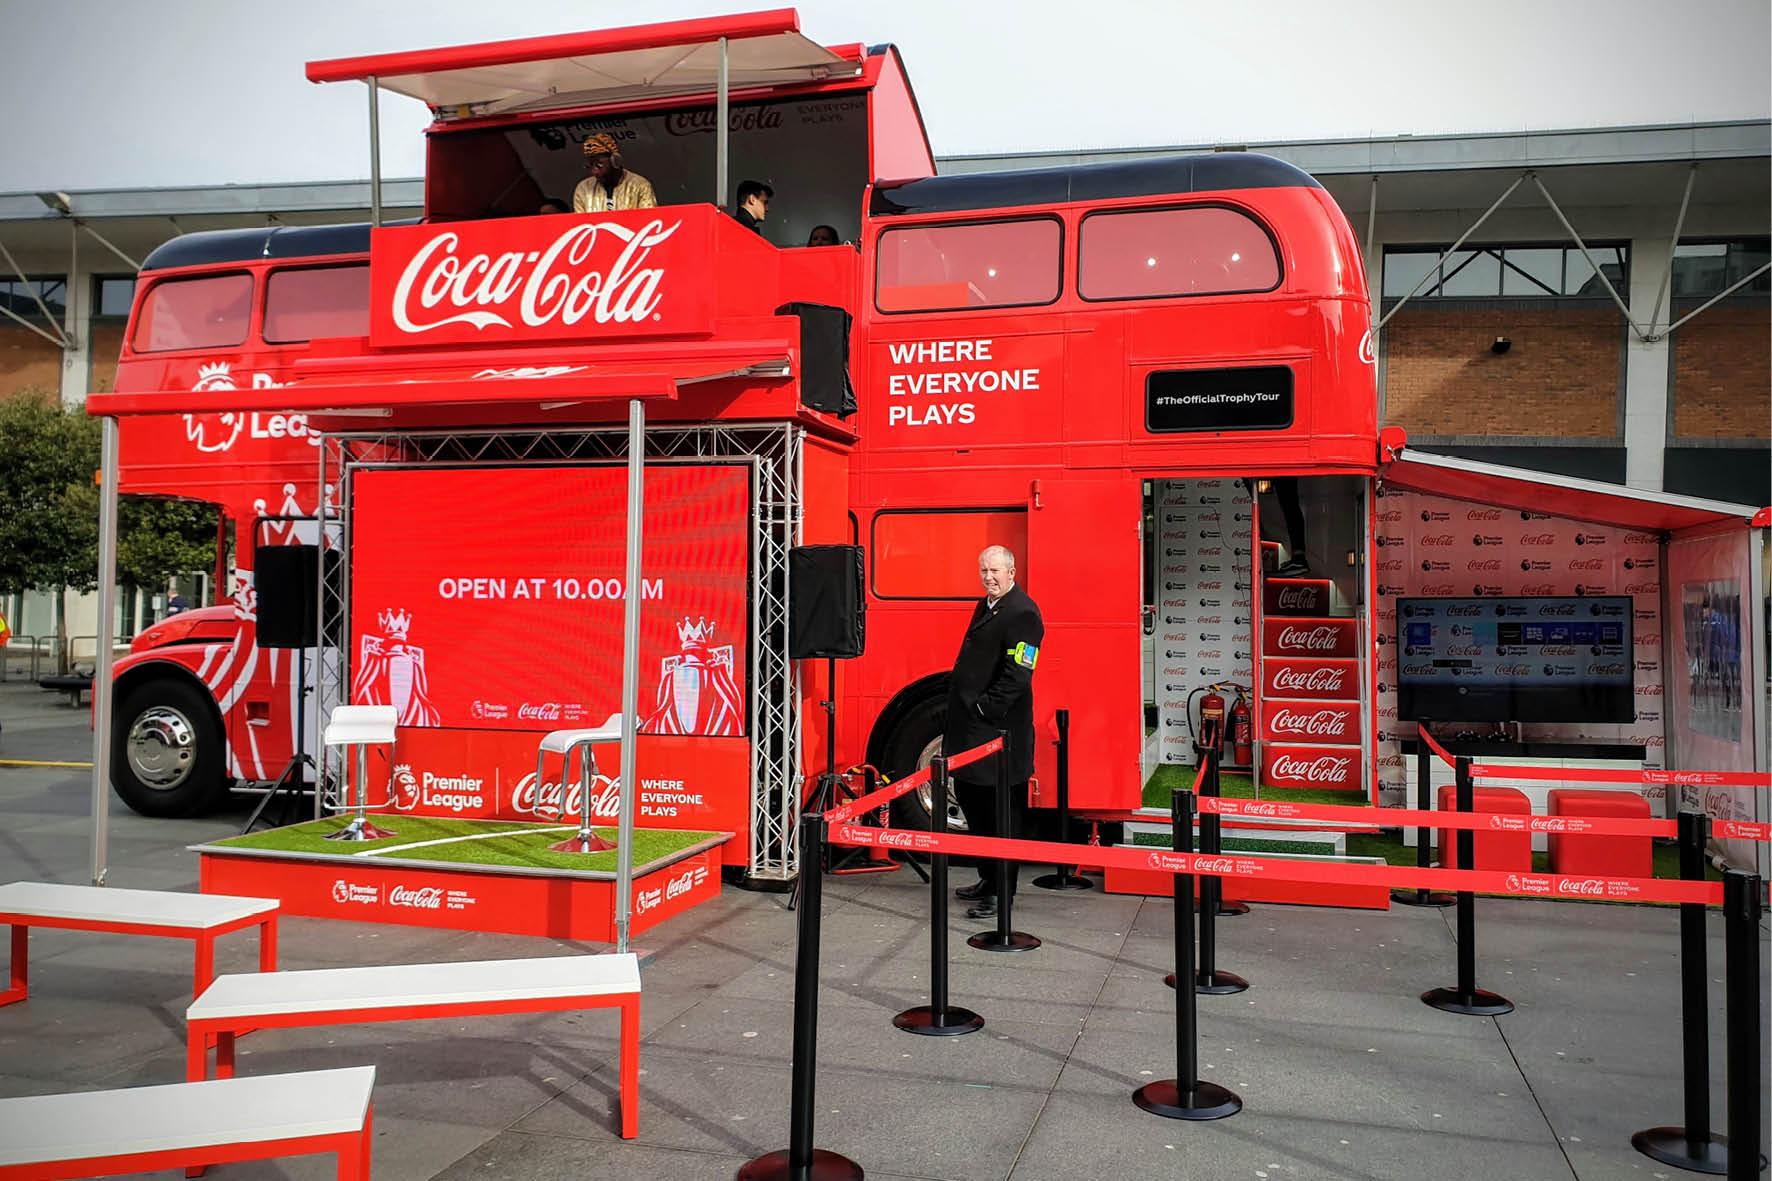 bus_business_2019_coca_cola_10.jpg